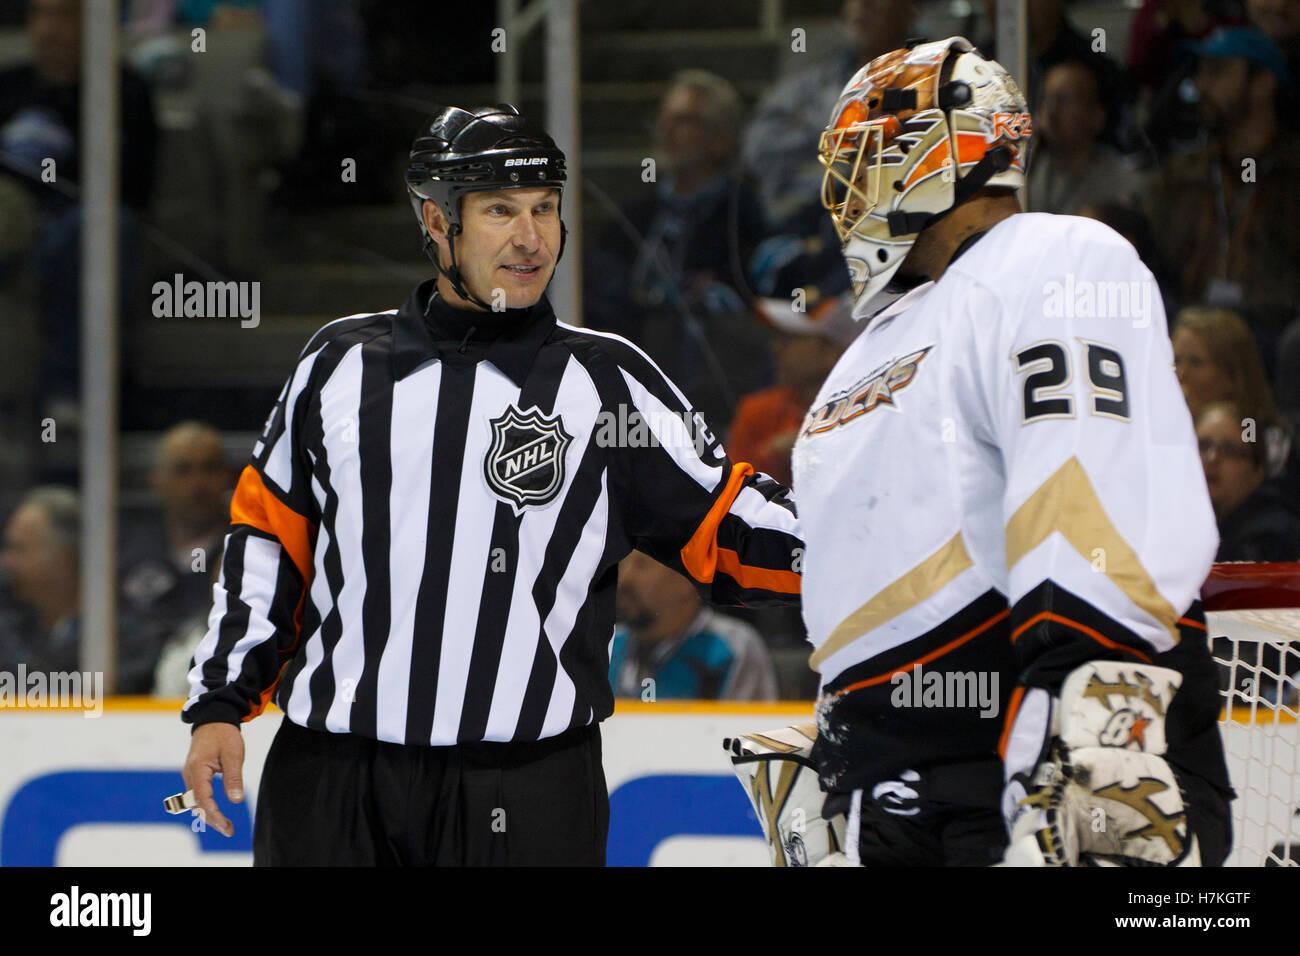 April 2, 2011; San Jose, CA, USA;  NHL referee Stephen Walkom (24) talks to Anaheim Ducks goalie Ray Emery (29) - Stock Image